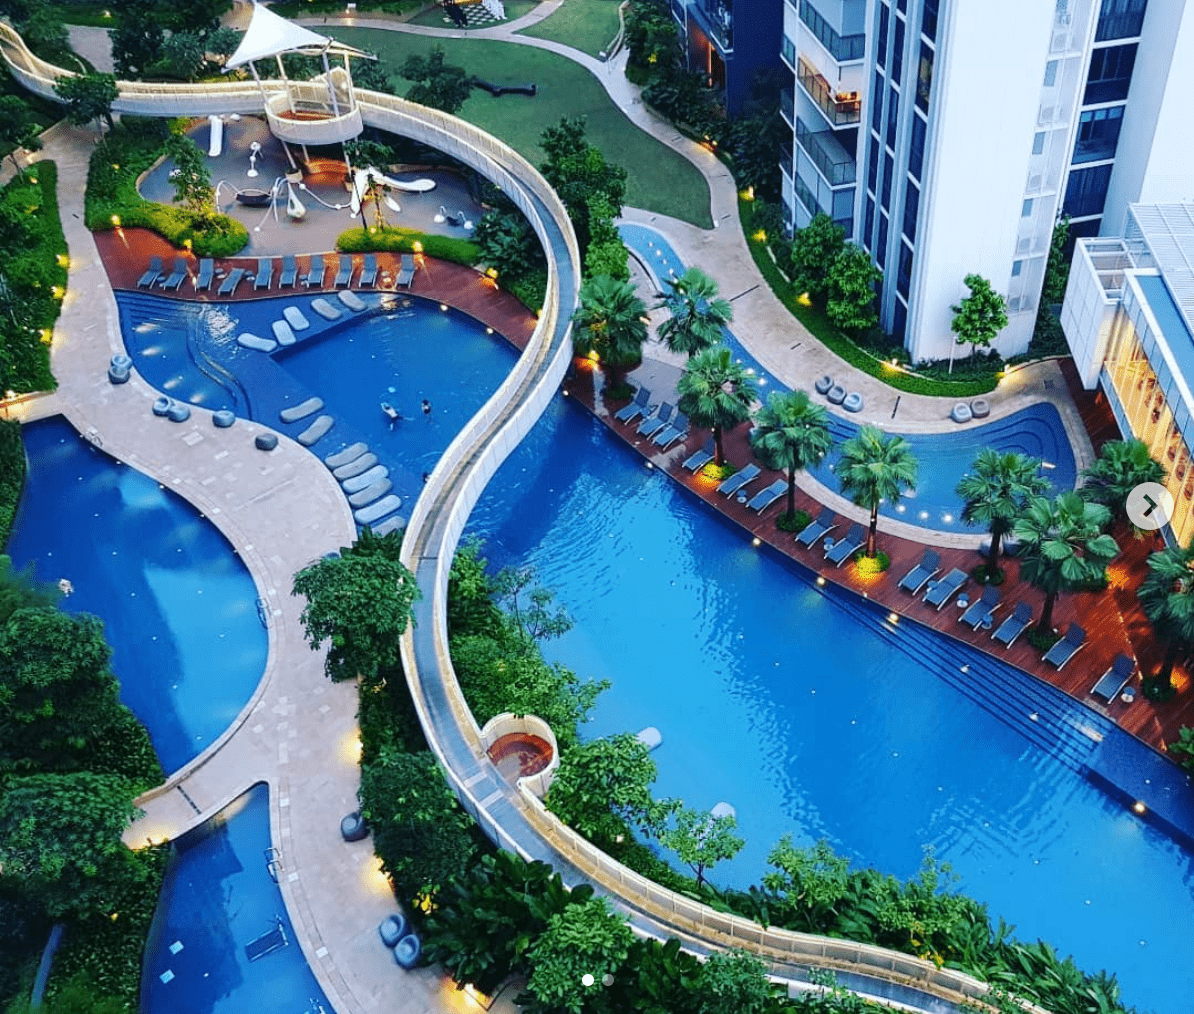 Best Condo Swimming Pools - The Panorama